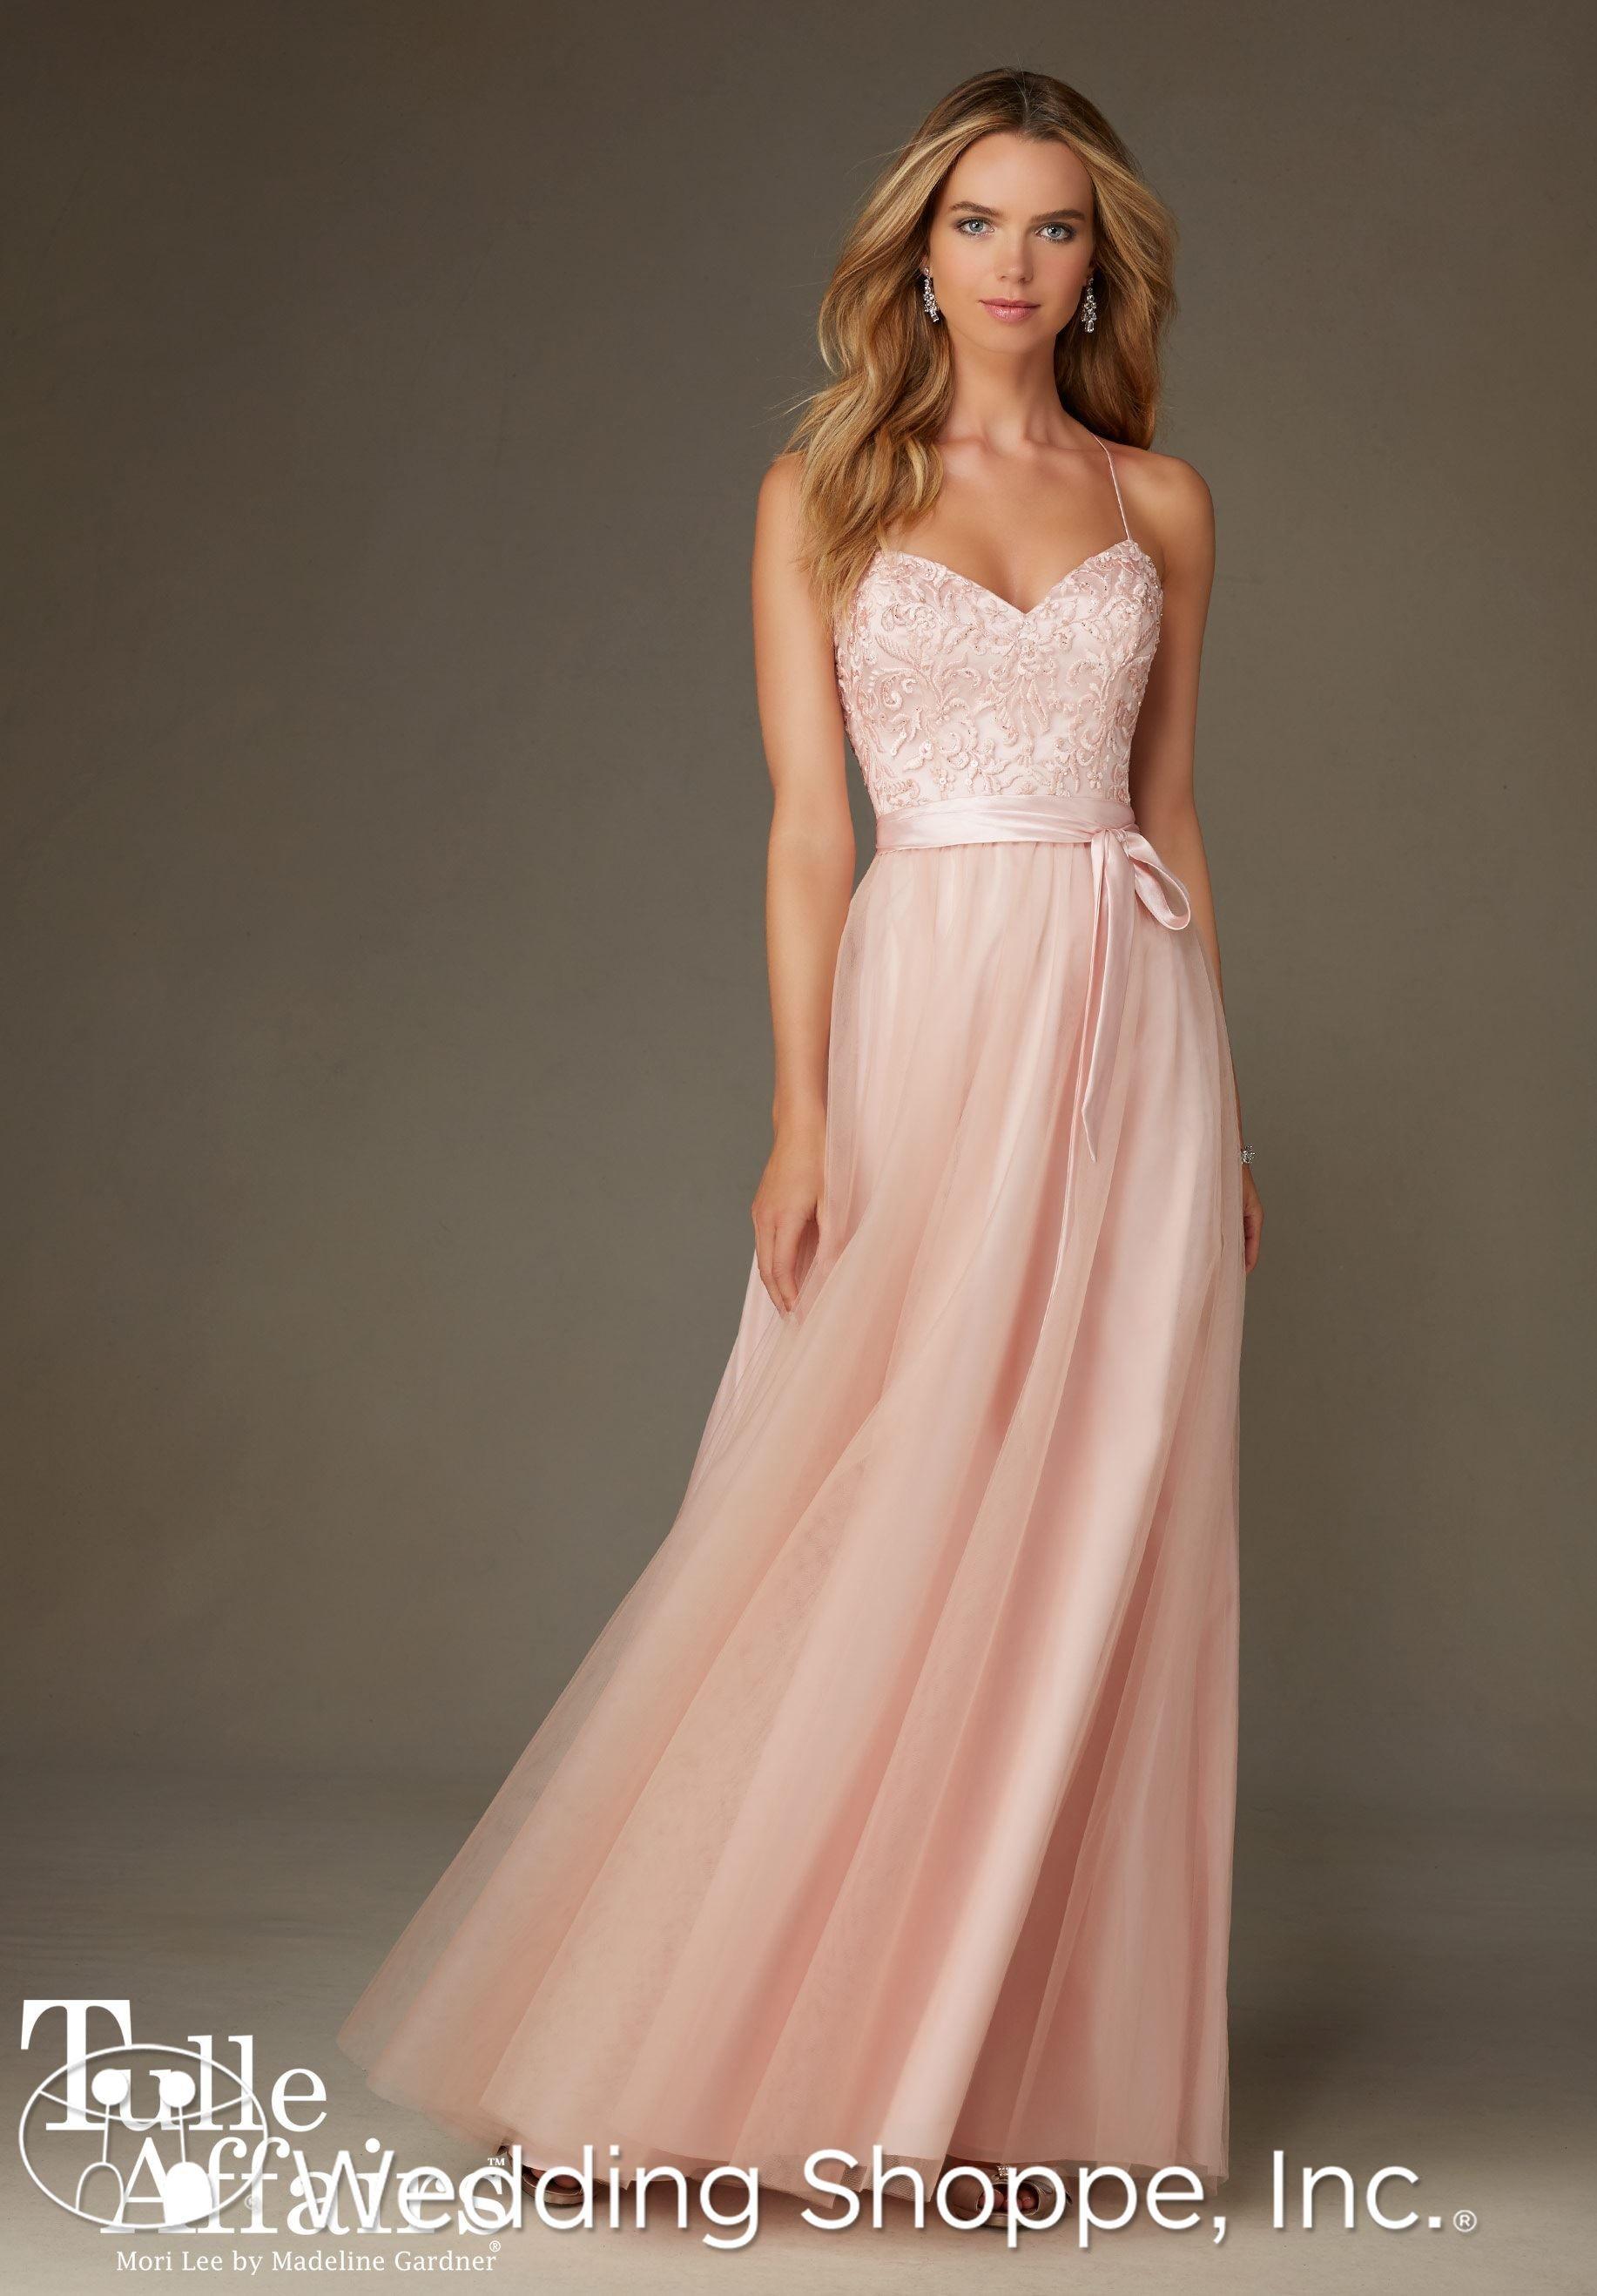 Mori Lee Bridesmaid Dress 132 | Kleider